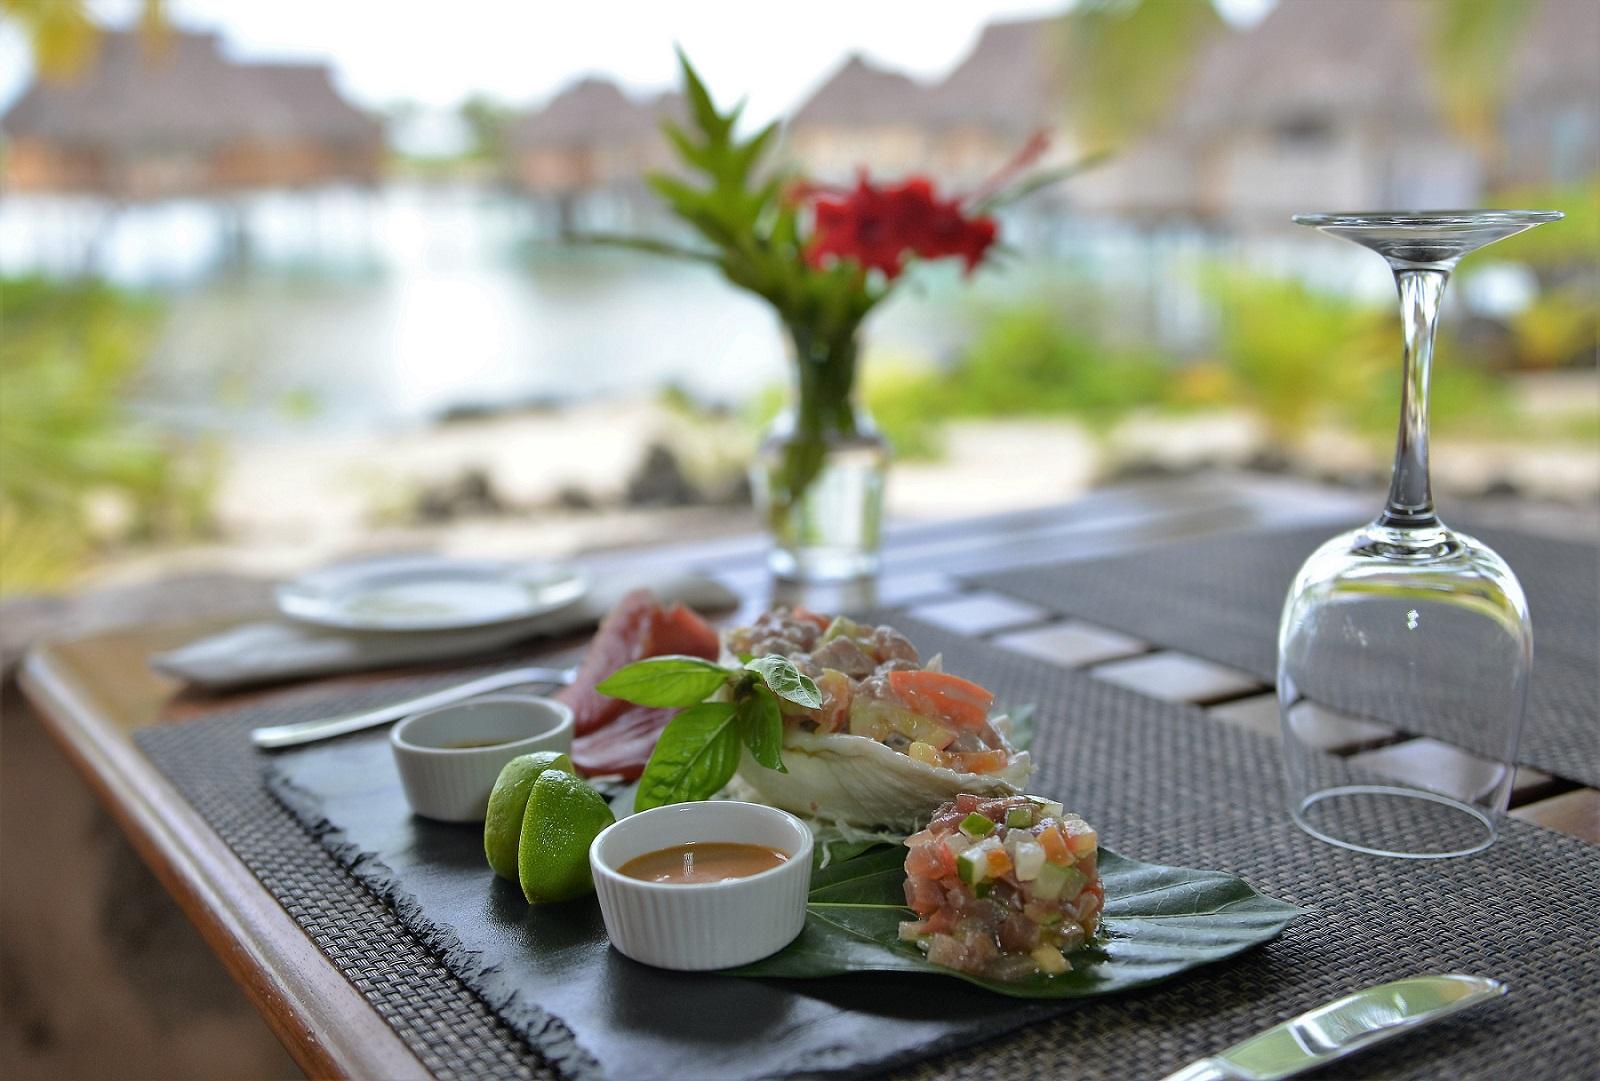 https://tahititourisme.ca/wp-content/uploads/2021/10/TPBR-buffet-breakfast-®-M.Colombini-5-instagram-Copie.jpg